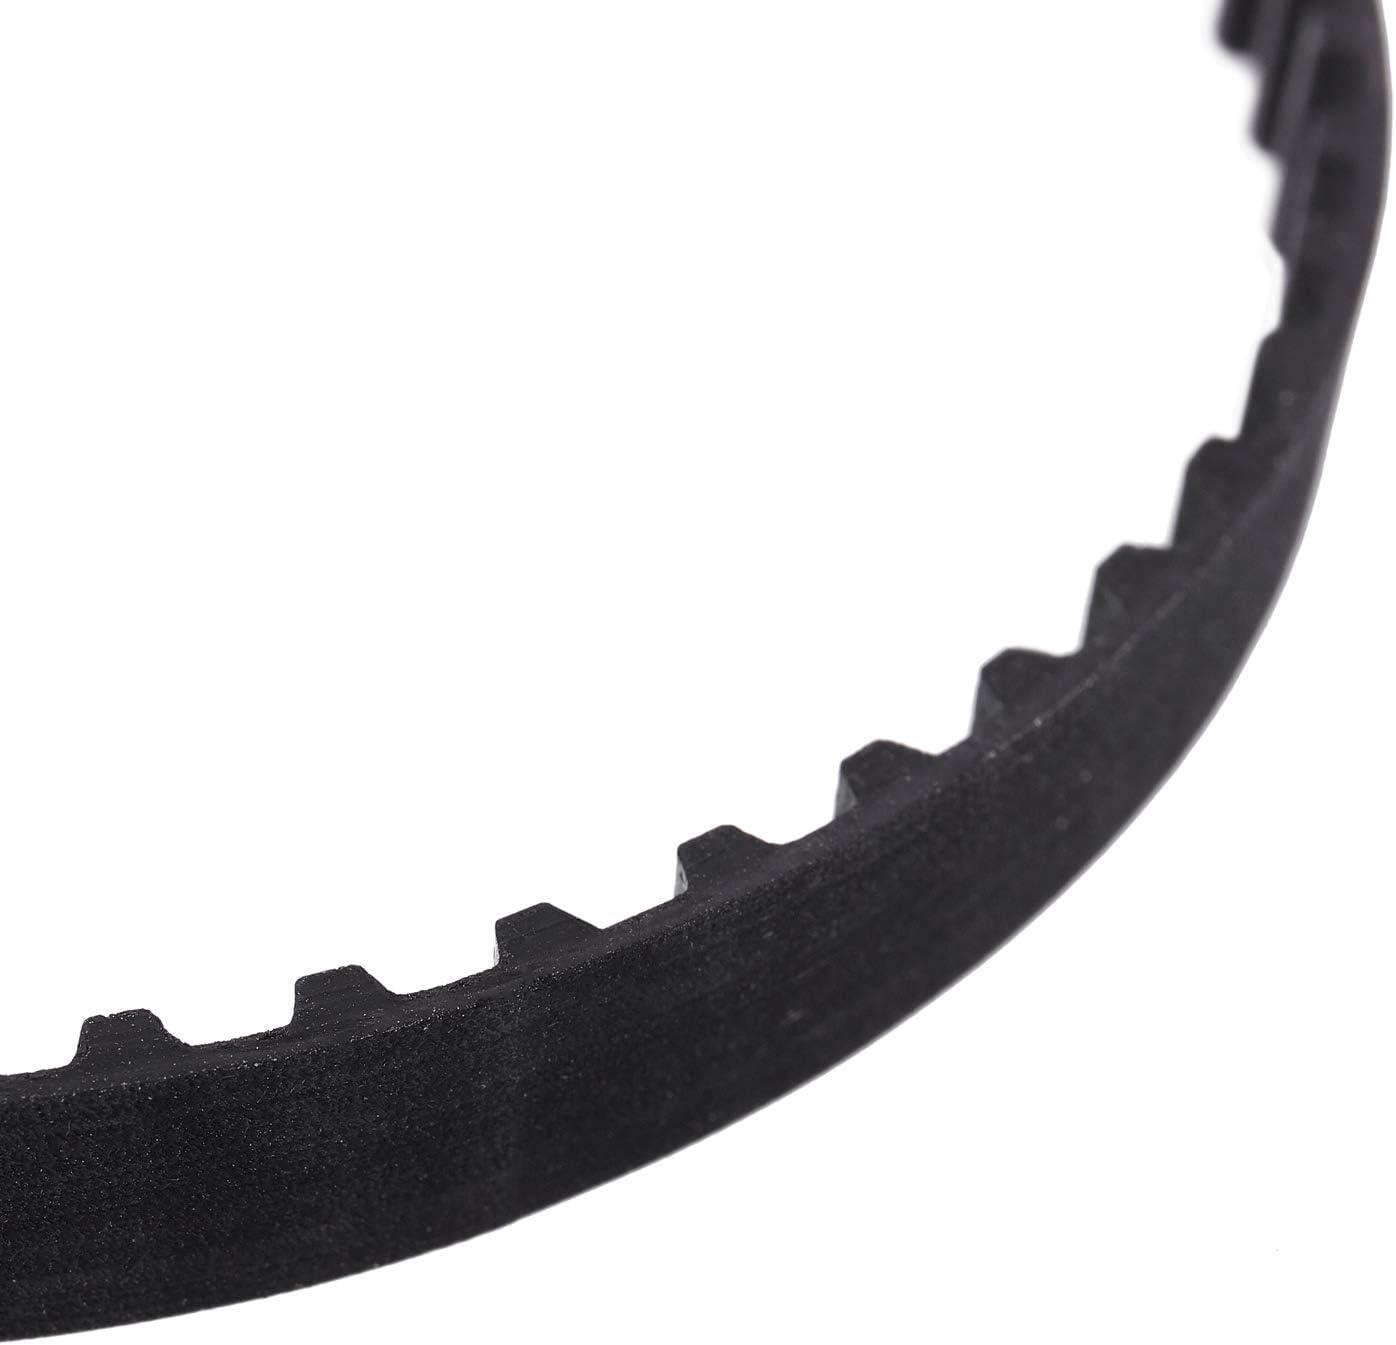 Yebobo 106XL 031 53 Teeth 7.9mm Width Rubber Drying Machine Timing Belt Black